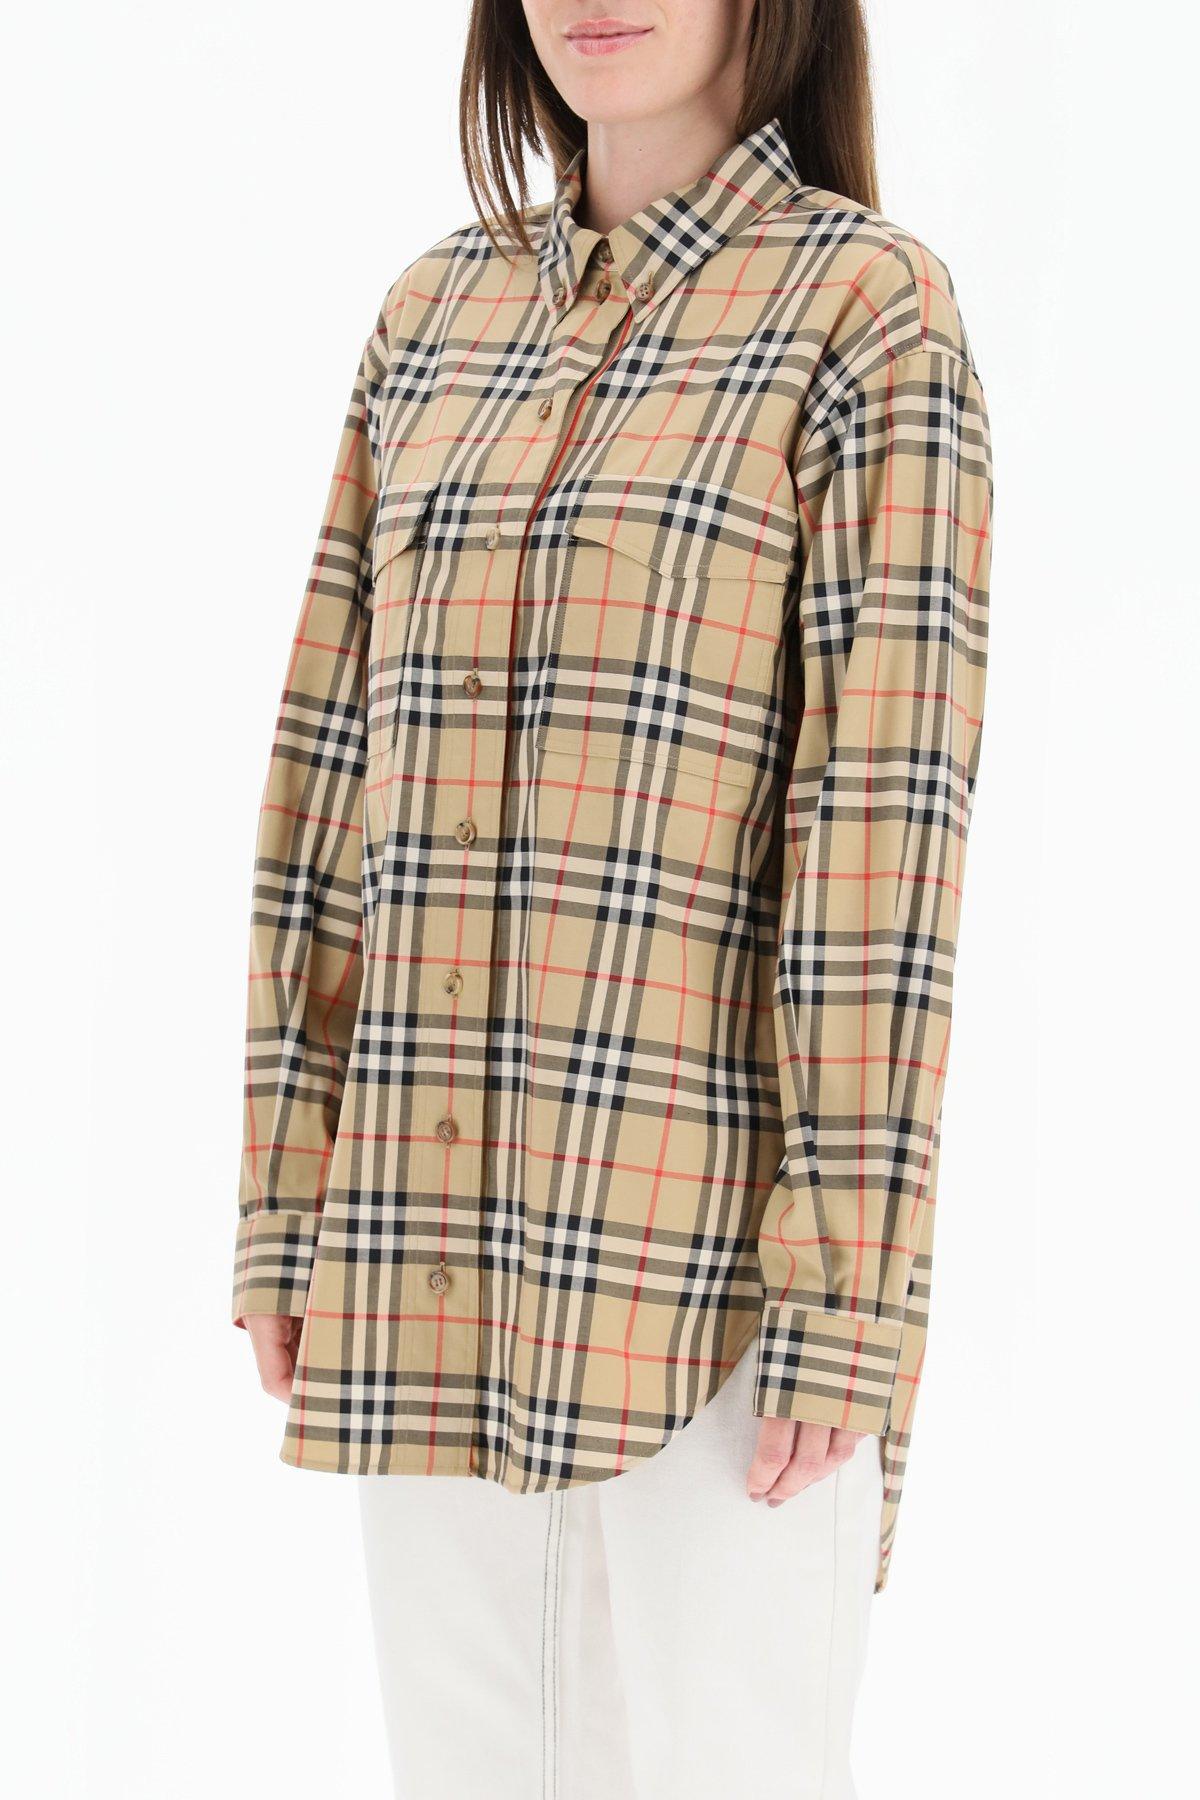 Burberry camicia oversize vintage check